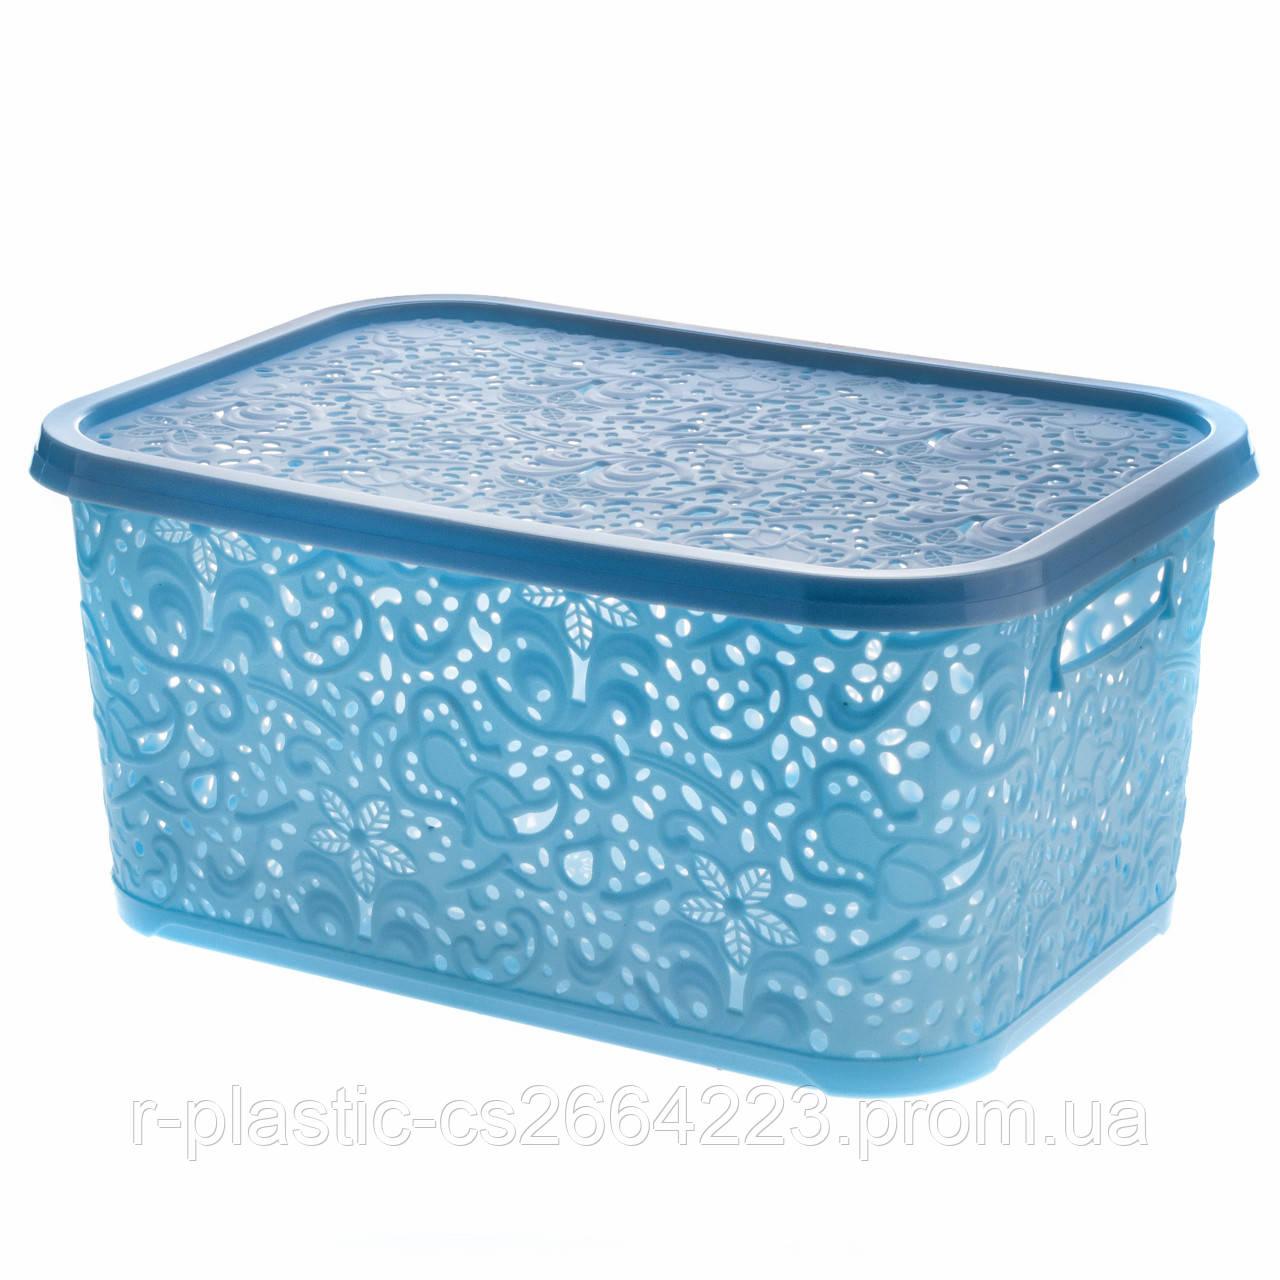 "Корзинка R-Plastic ""Ажур"" 22л 43,5*31*20,5см голубая"